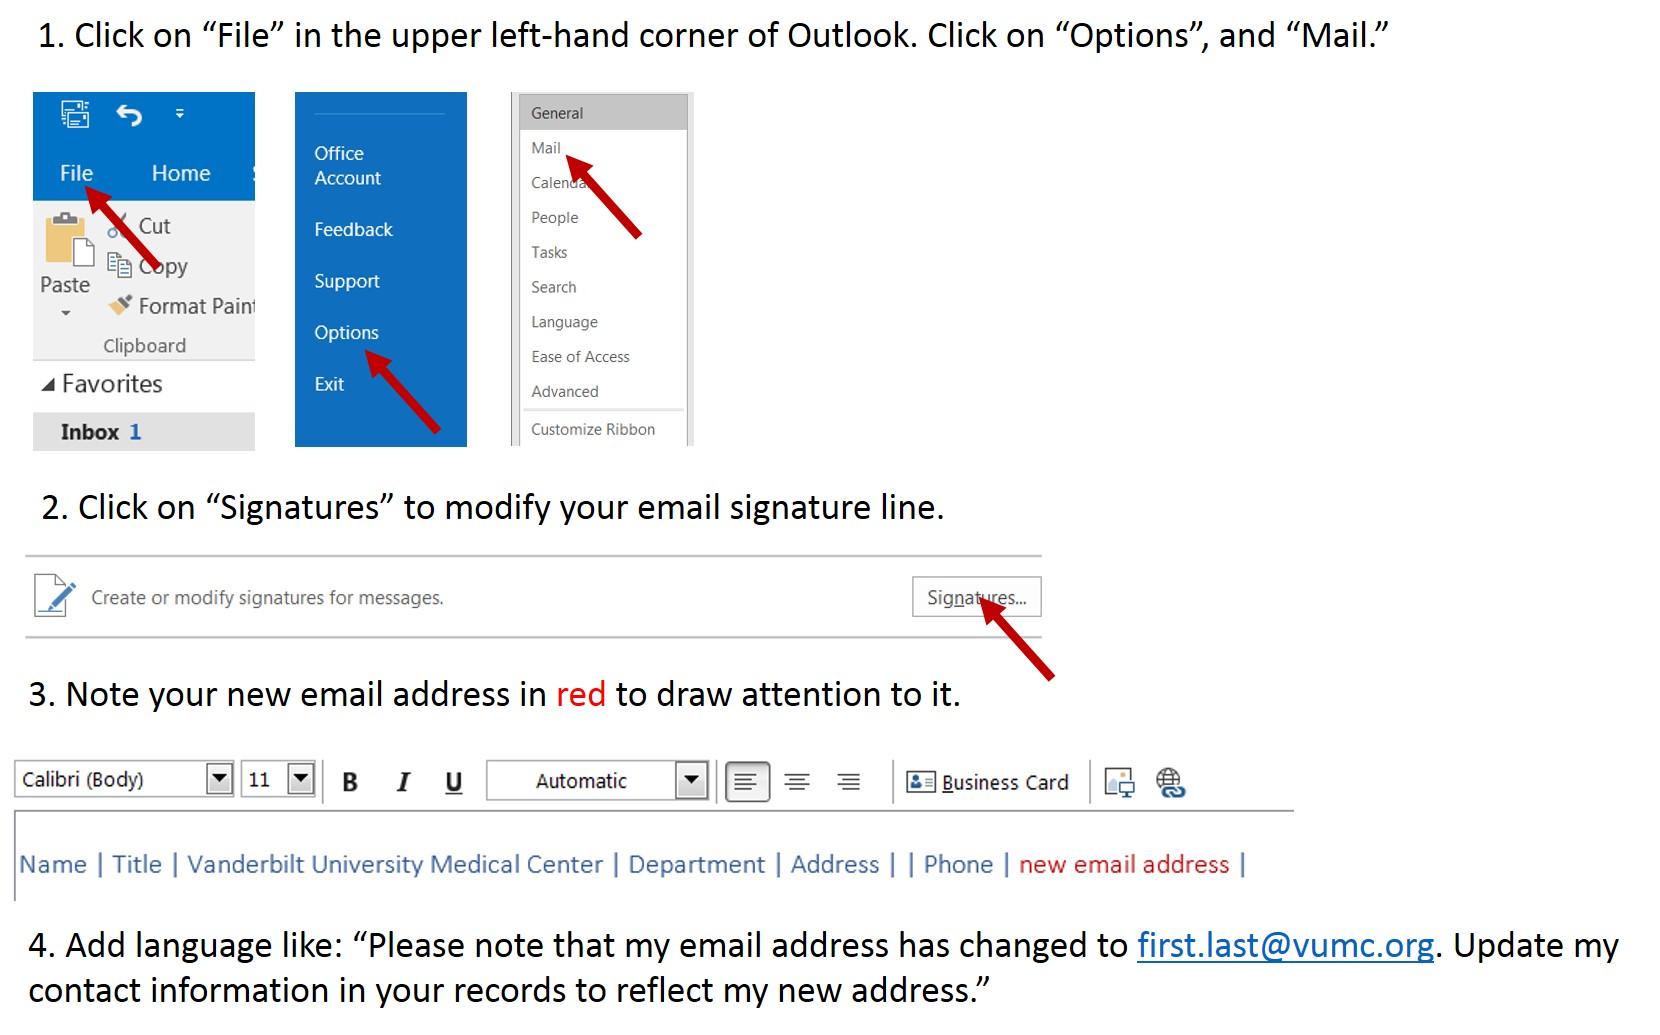 Change Email Signature Settings Pic 1.jpg